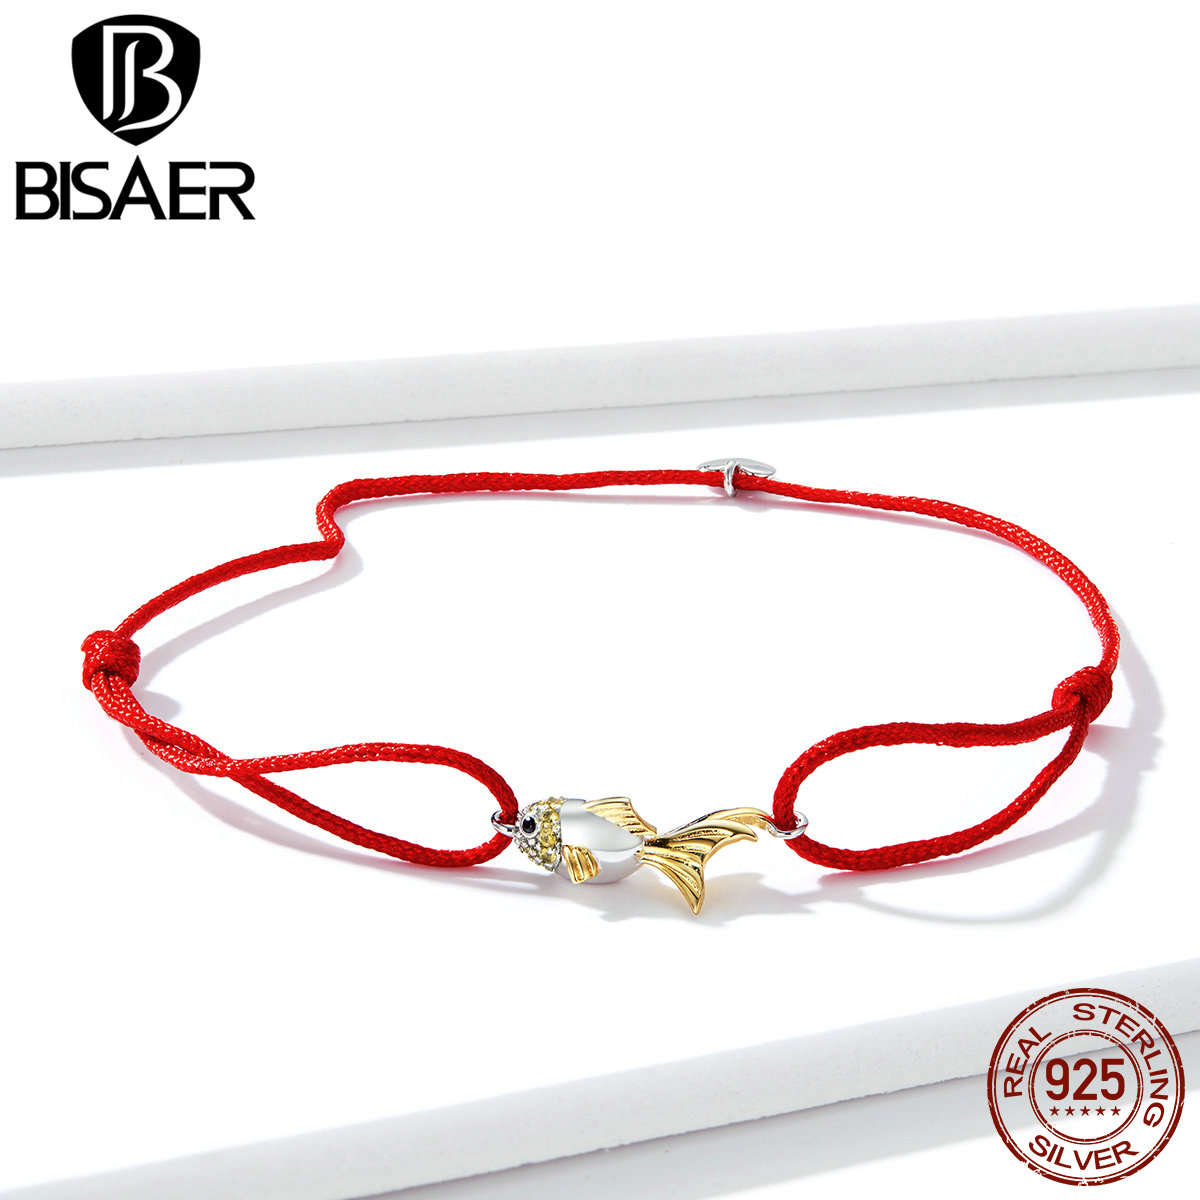 BISAER Lucky Goldfish Bracelets 925 Sterling Silver 19cm Adjustable Red Rope Wrist Chain Link Bracelet For Female Jewelry EFB044